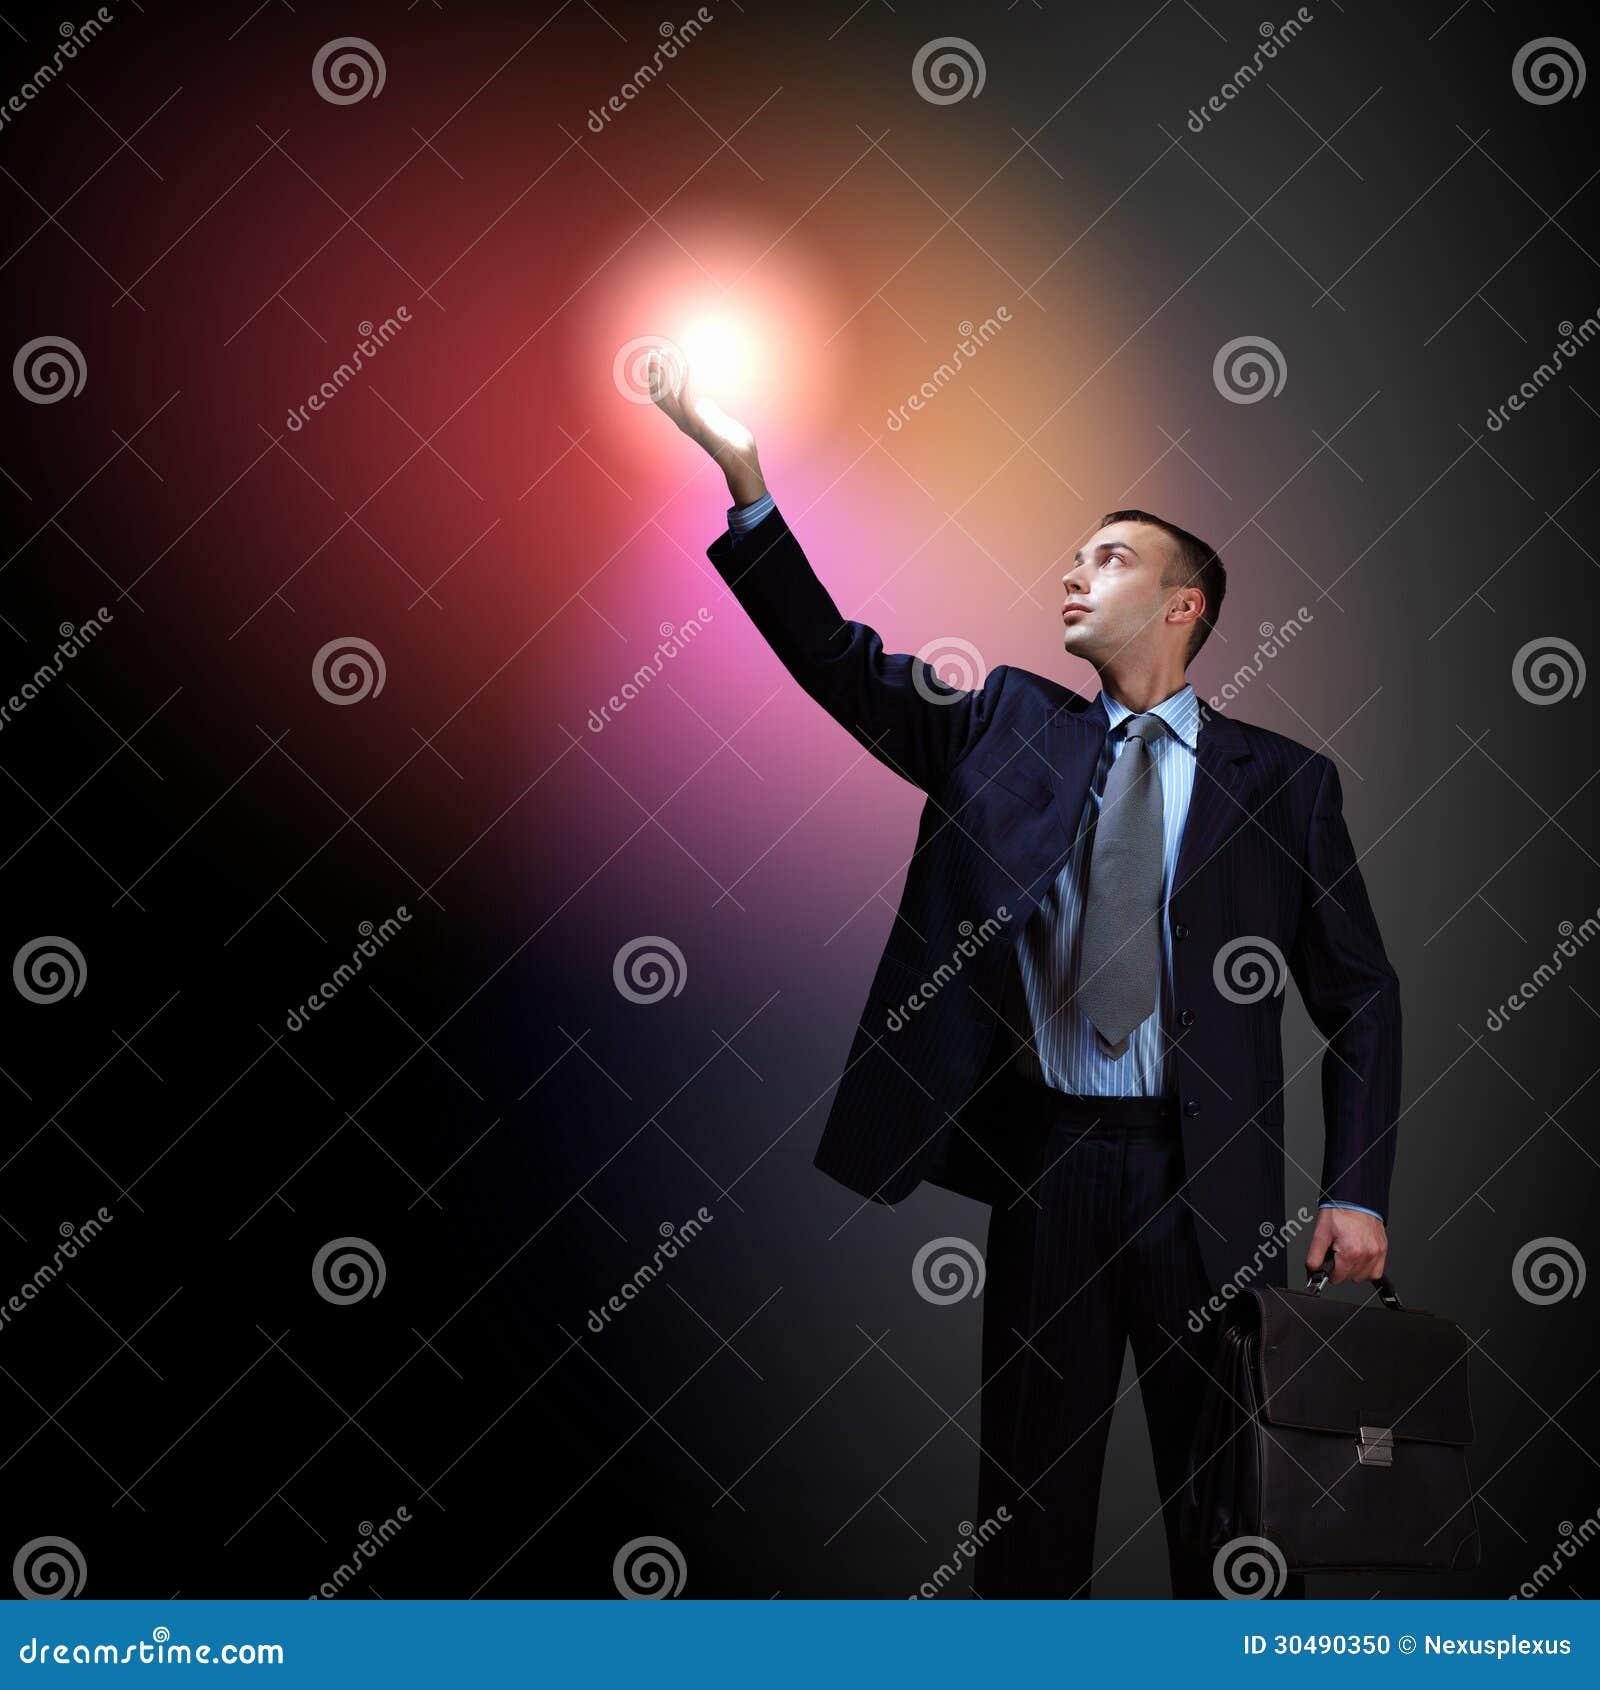 Technology Management Image: Businessman With Light Shining Stock Photo